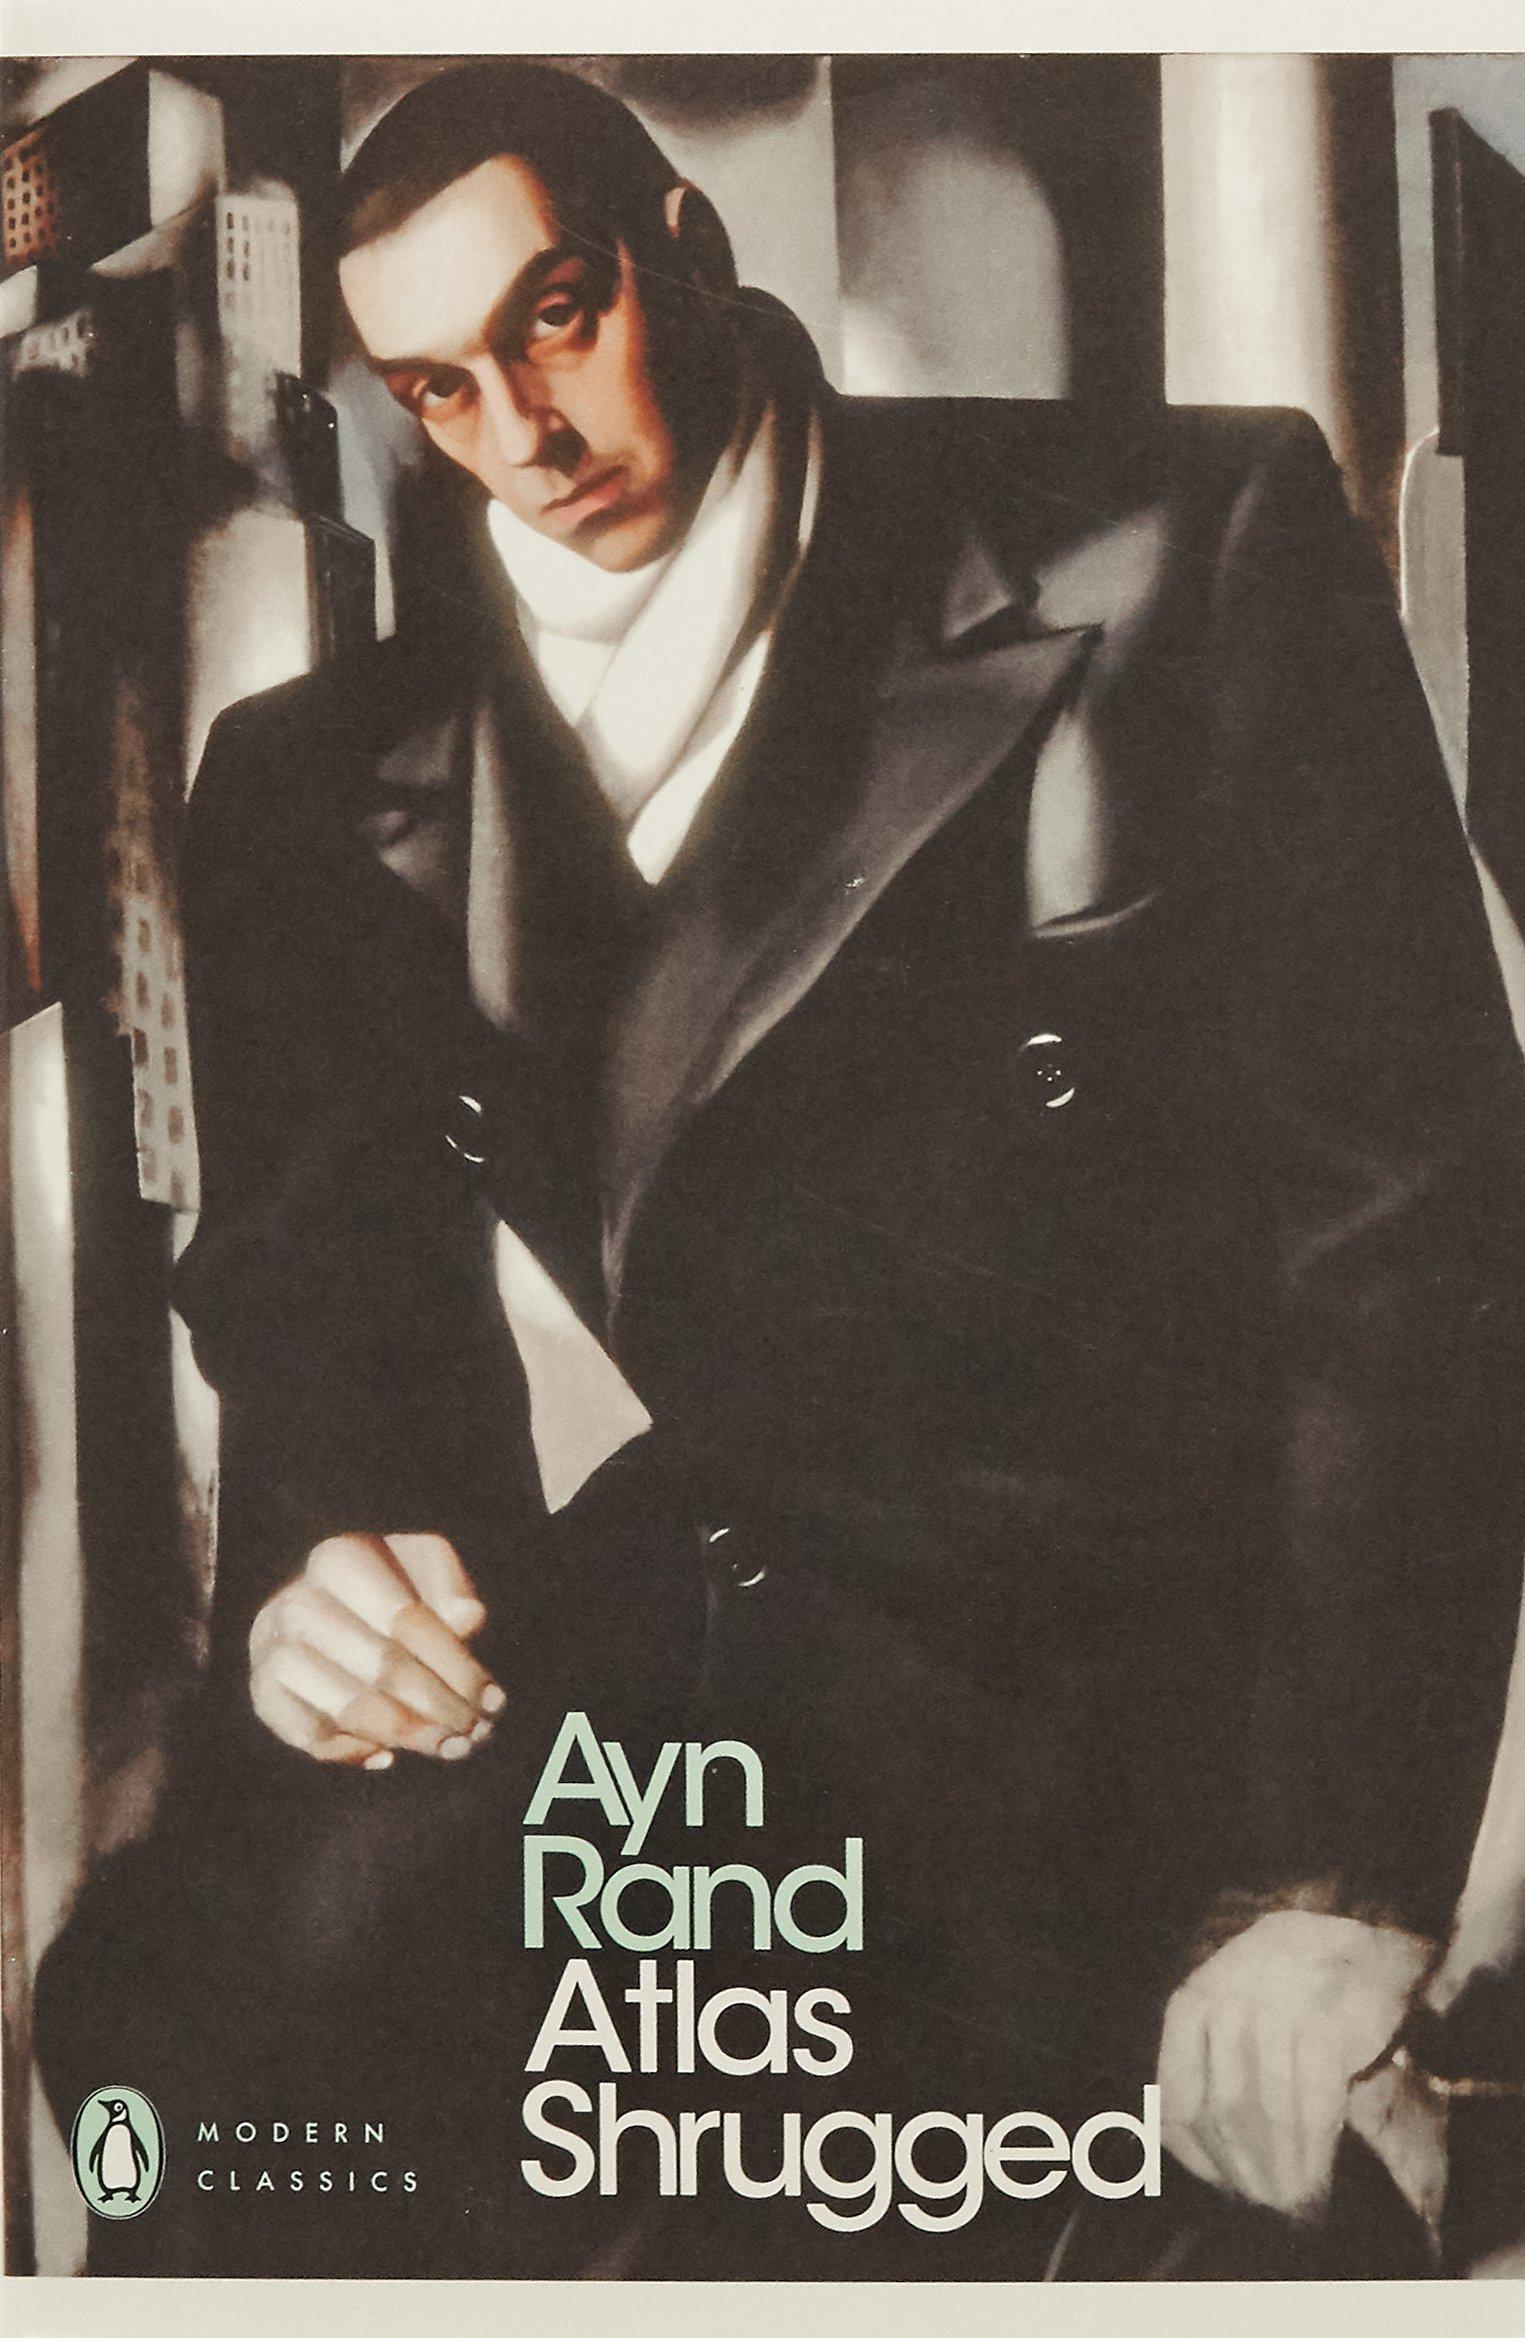 Atlas Shrugged (Penguin Modern Classics): Amazon.es: Ayn Rand: Libros en  idiomas extranjeros